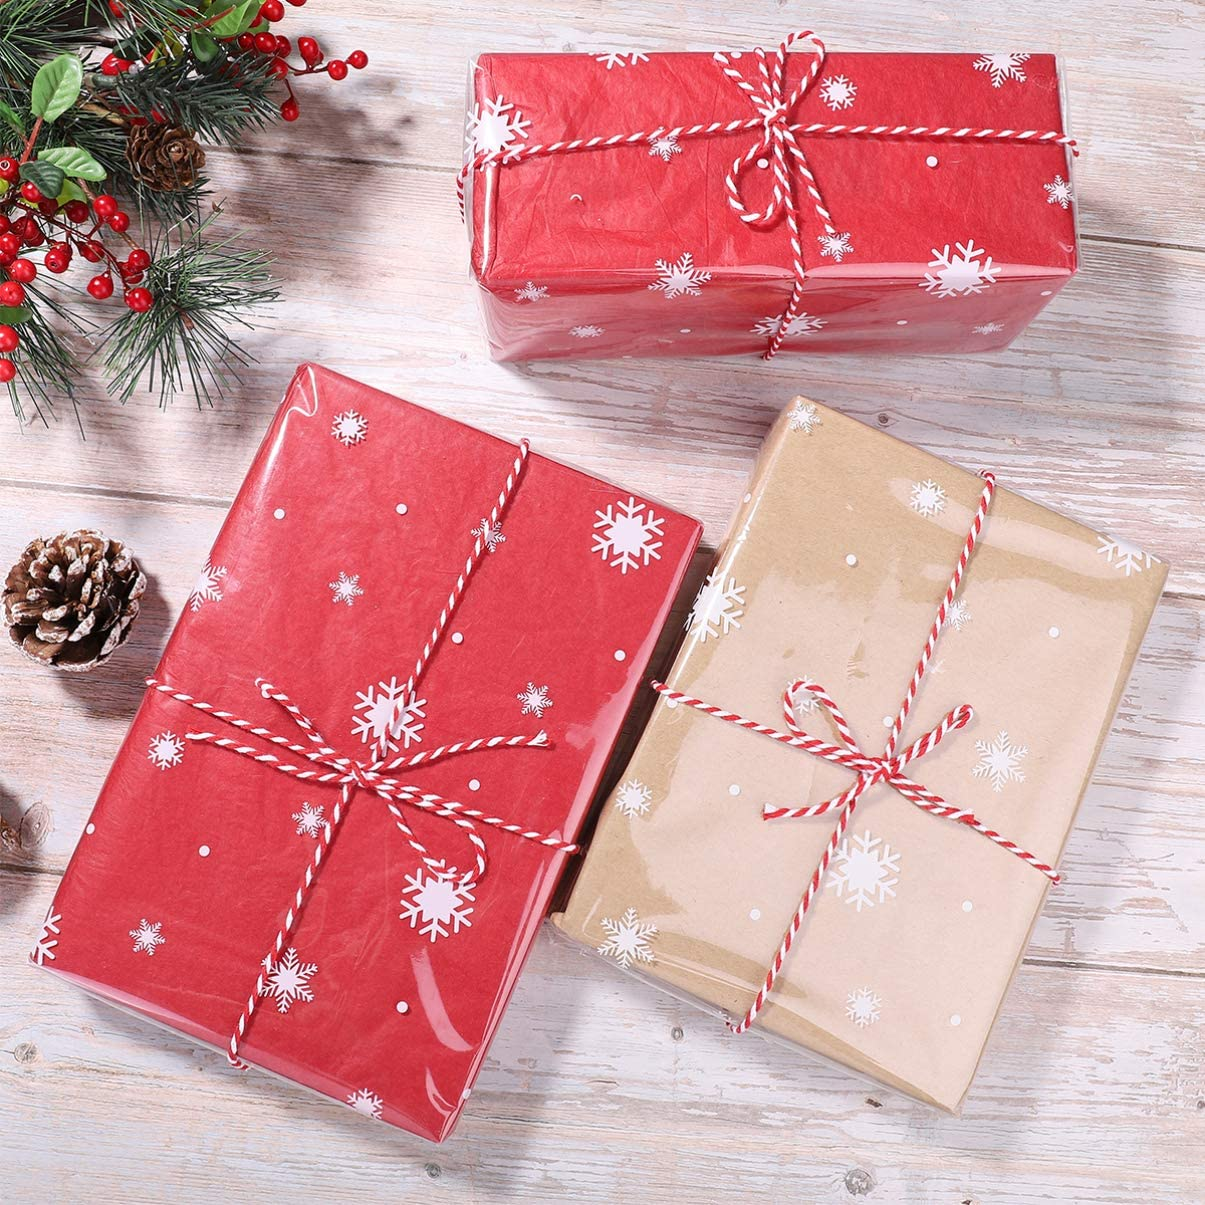 NUOBESTY Christmas Wrapping Paper 1Roll 30mx40cm 2.5 Mil Santa Claus Snowman Cellophane Wrap Santa Thick Florist Wrapping Cellophane Paper for Arts Crafts Baskets